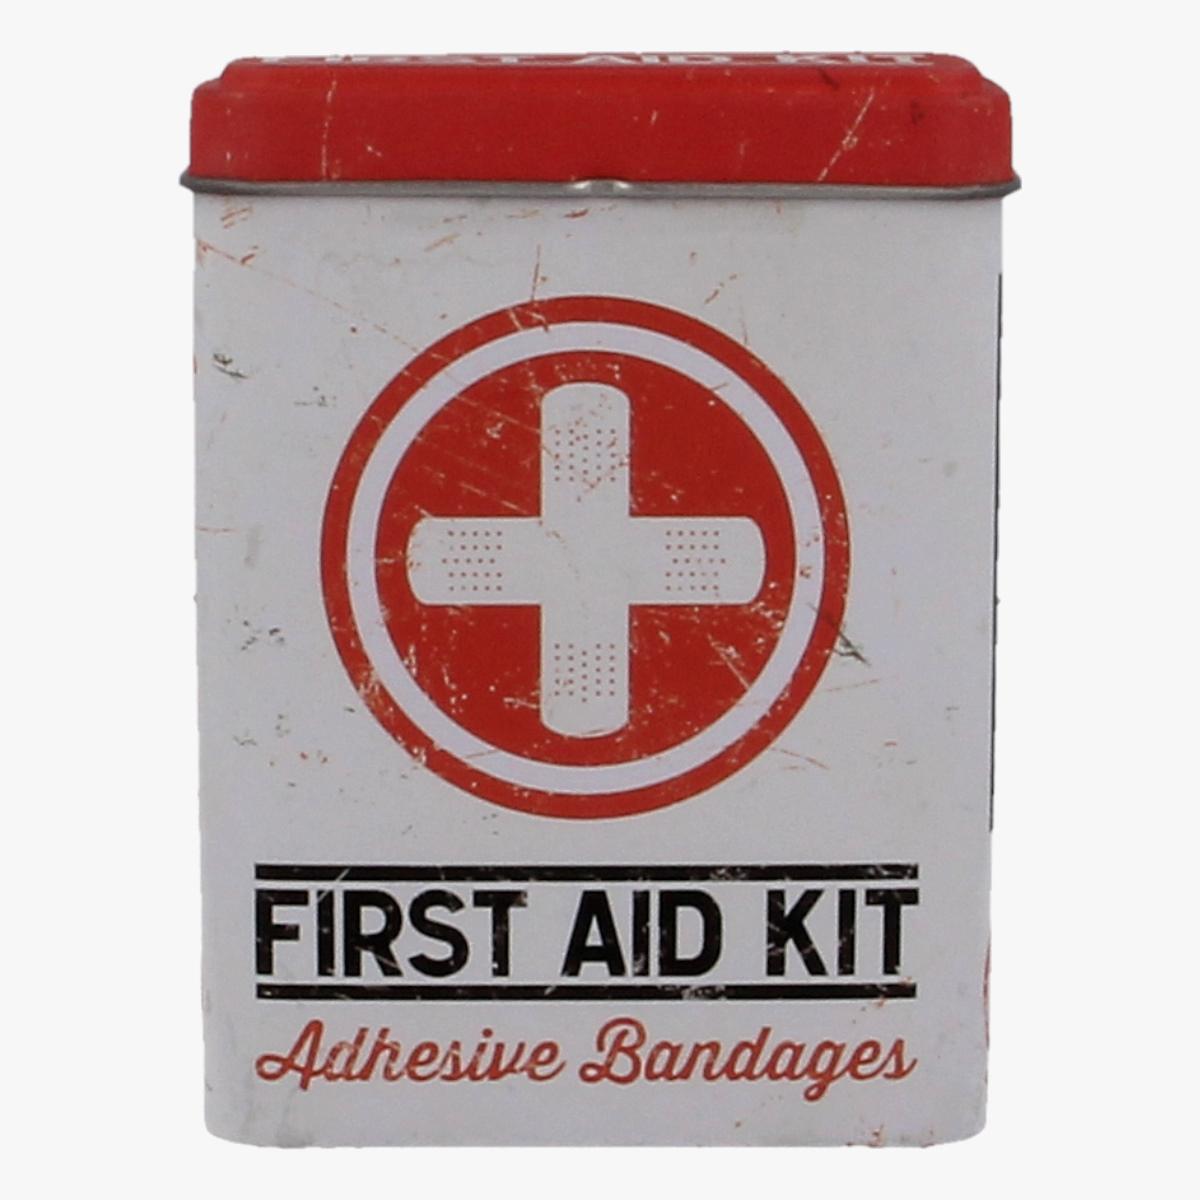 Afbeeldingen van First Aid Kit - Adhesive Bandages